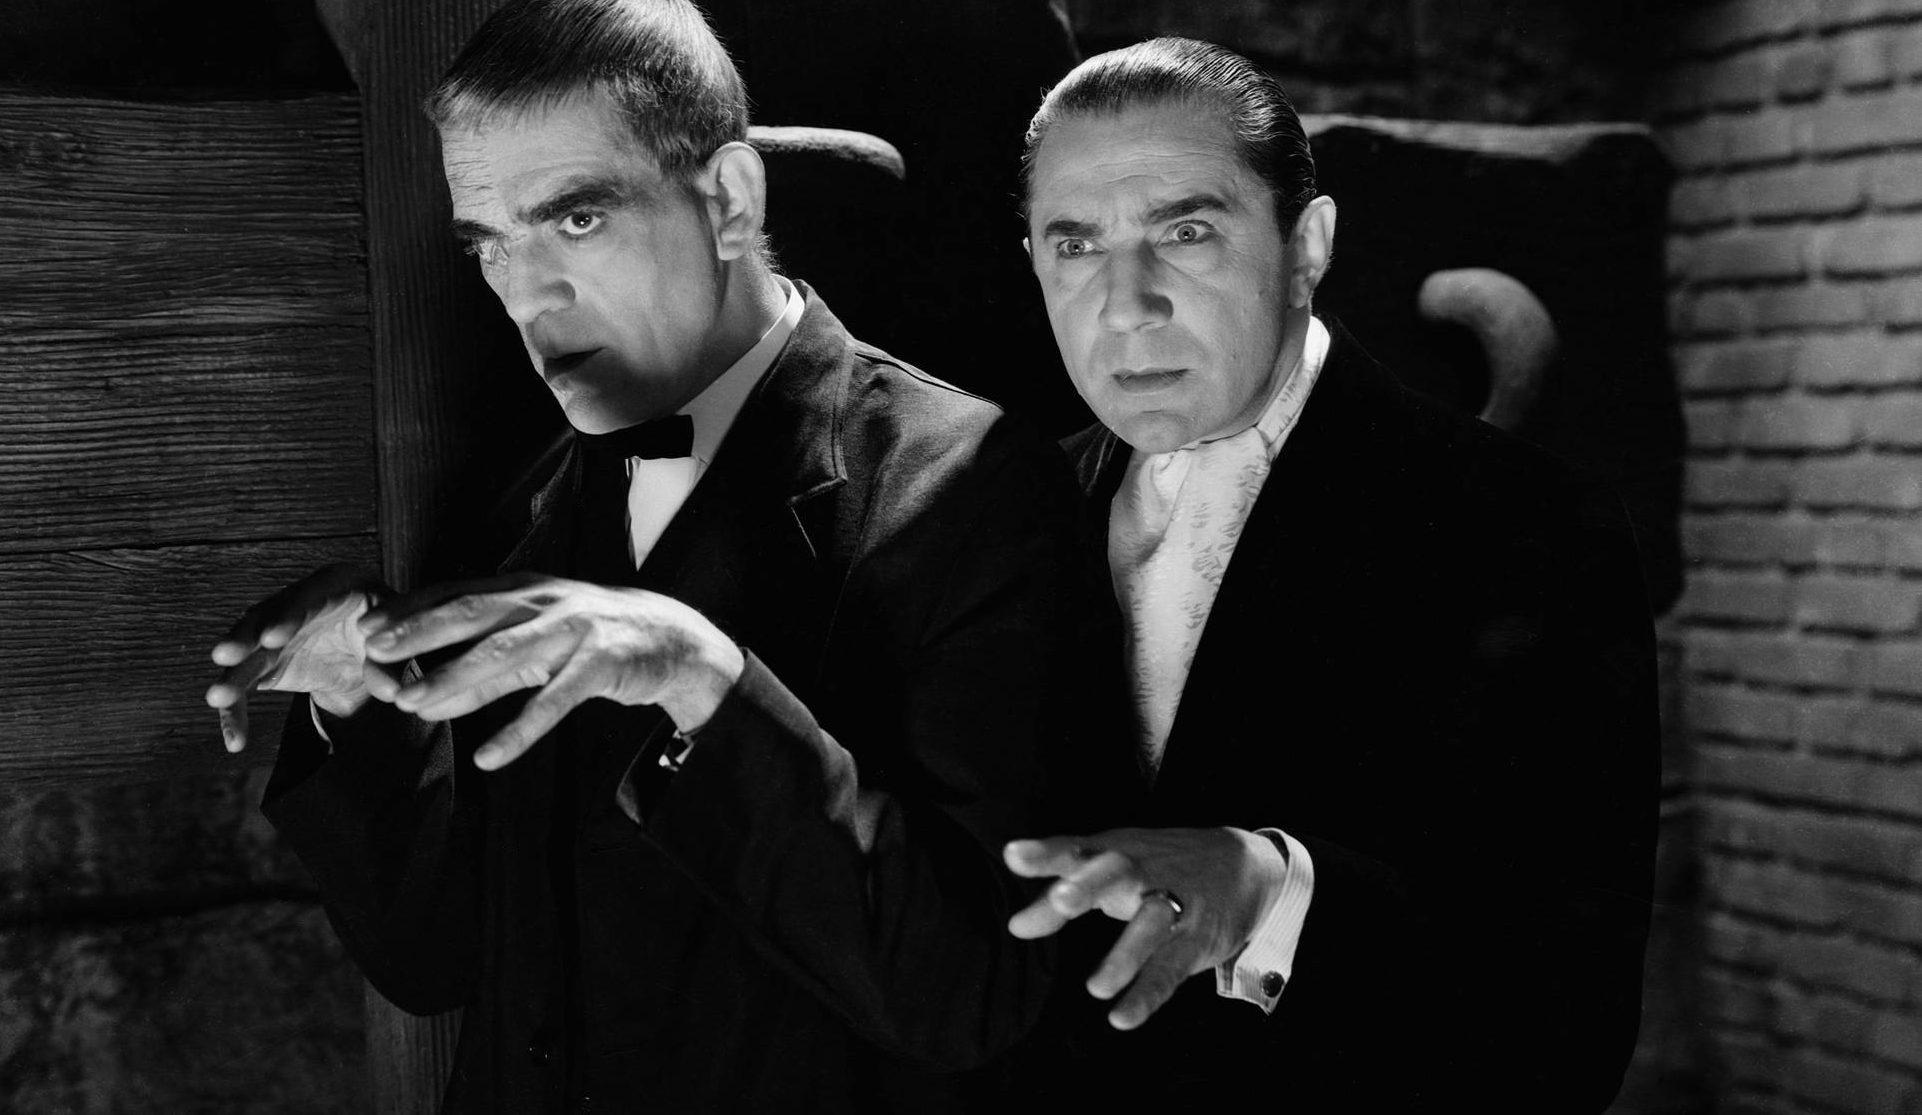 Poe-obsessed surgeon Bela Lugosi and facially disfigured escaped murderer Boris Karloff in The Raven (1935)